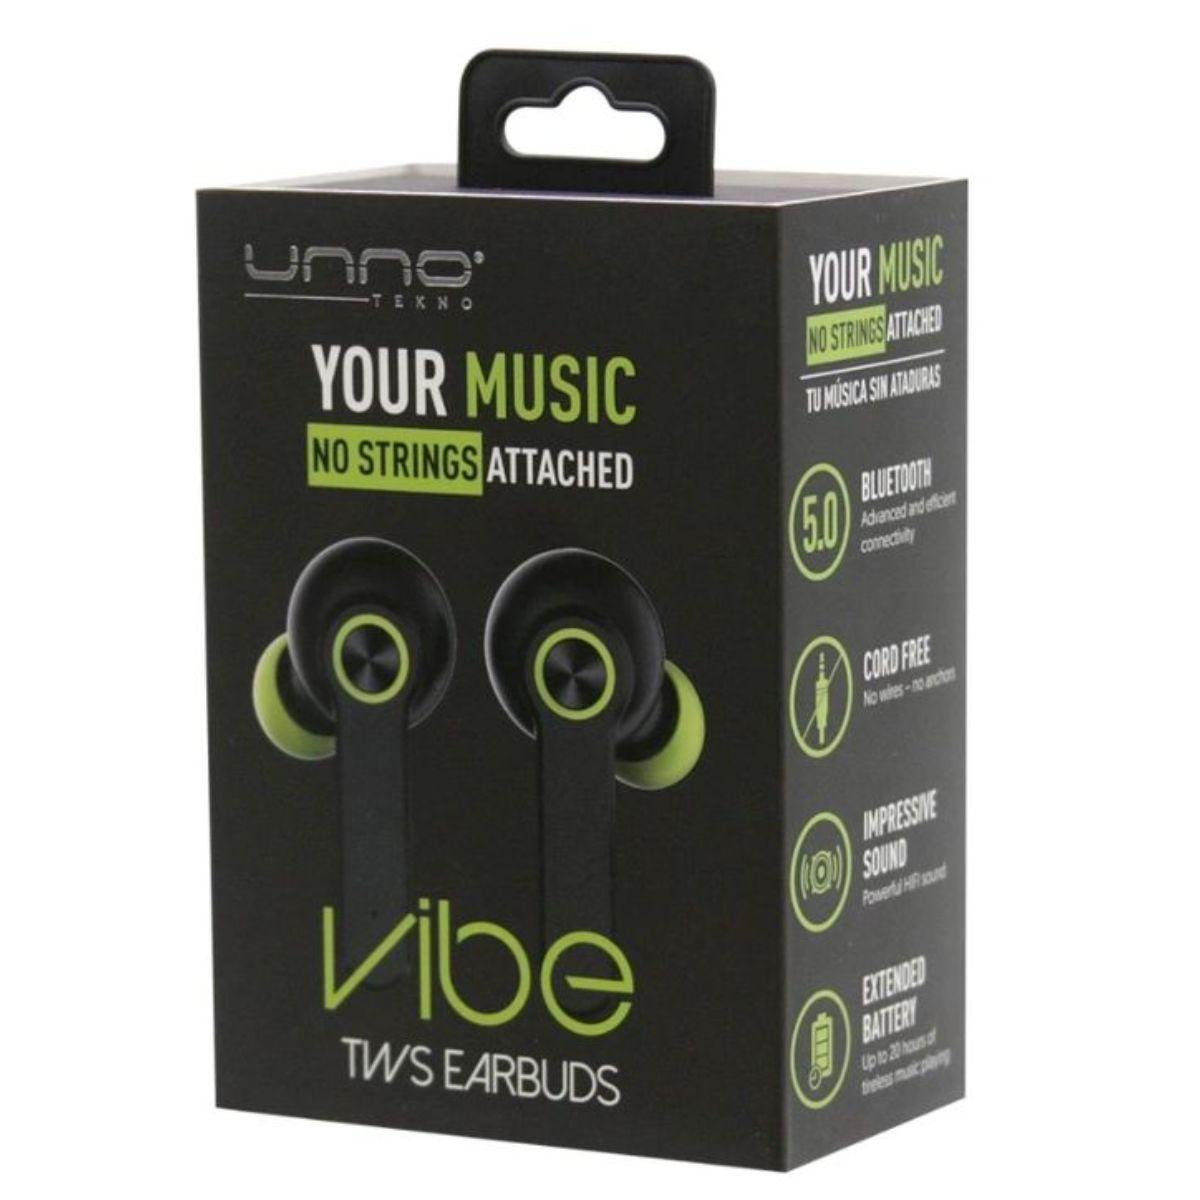 auriculares inalambricos tws vibe 2 1 1